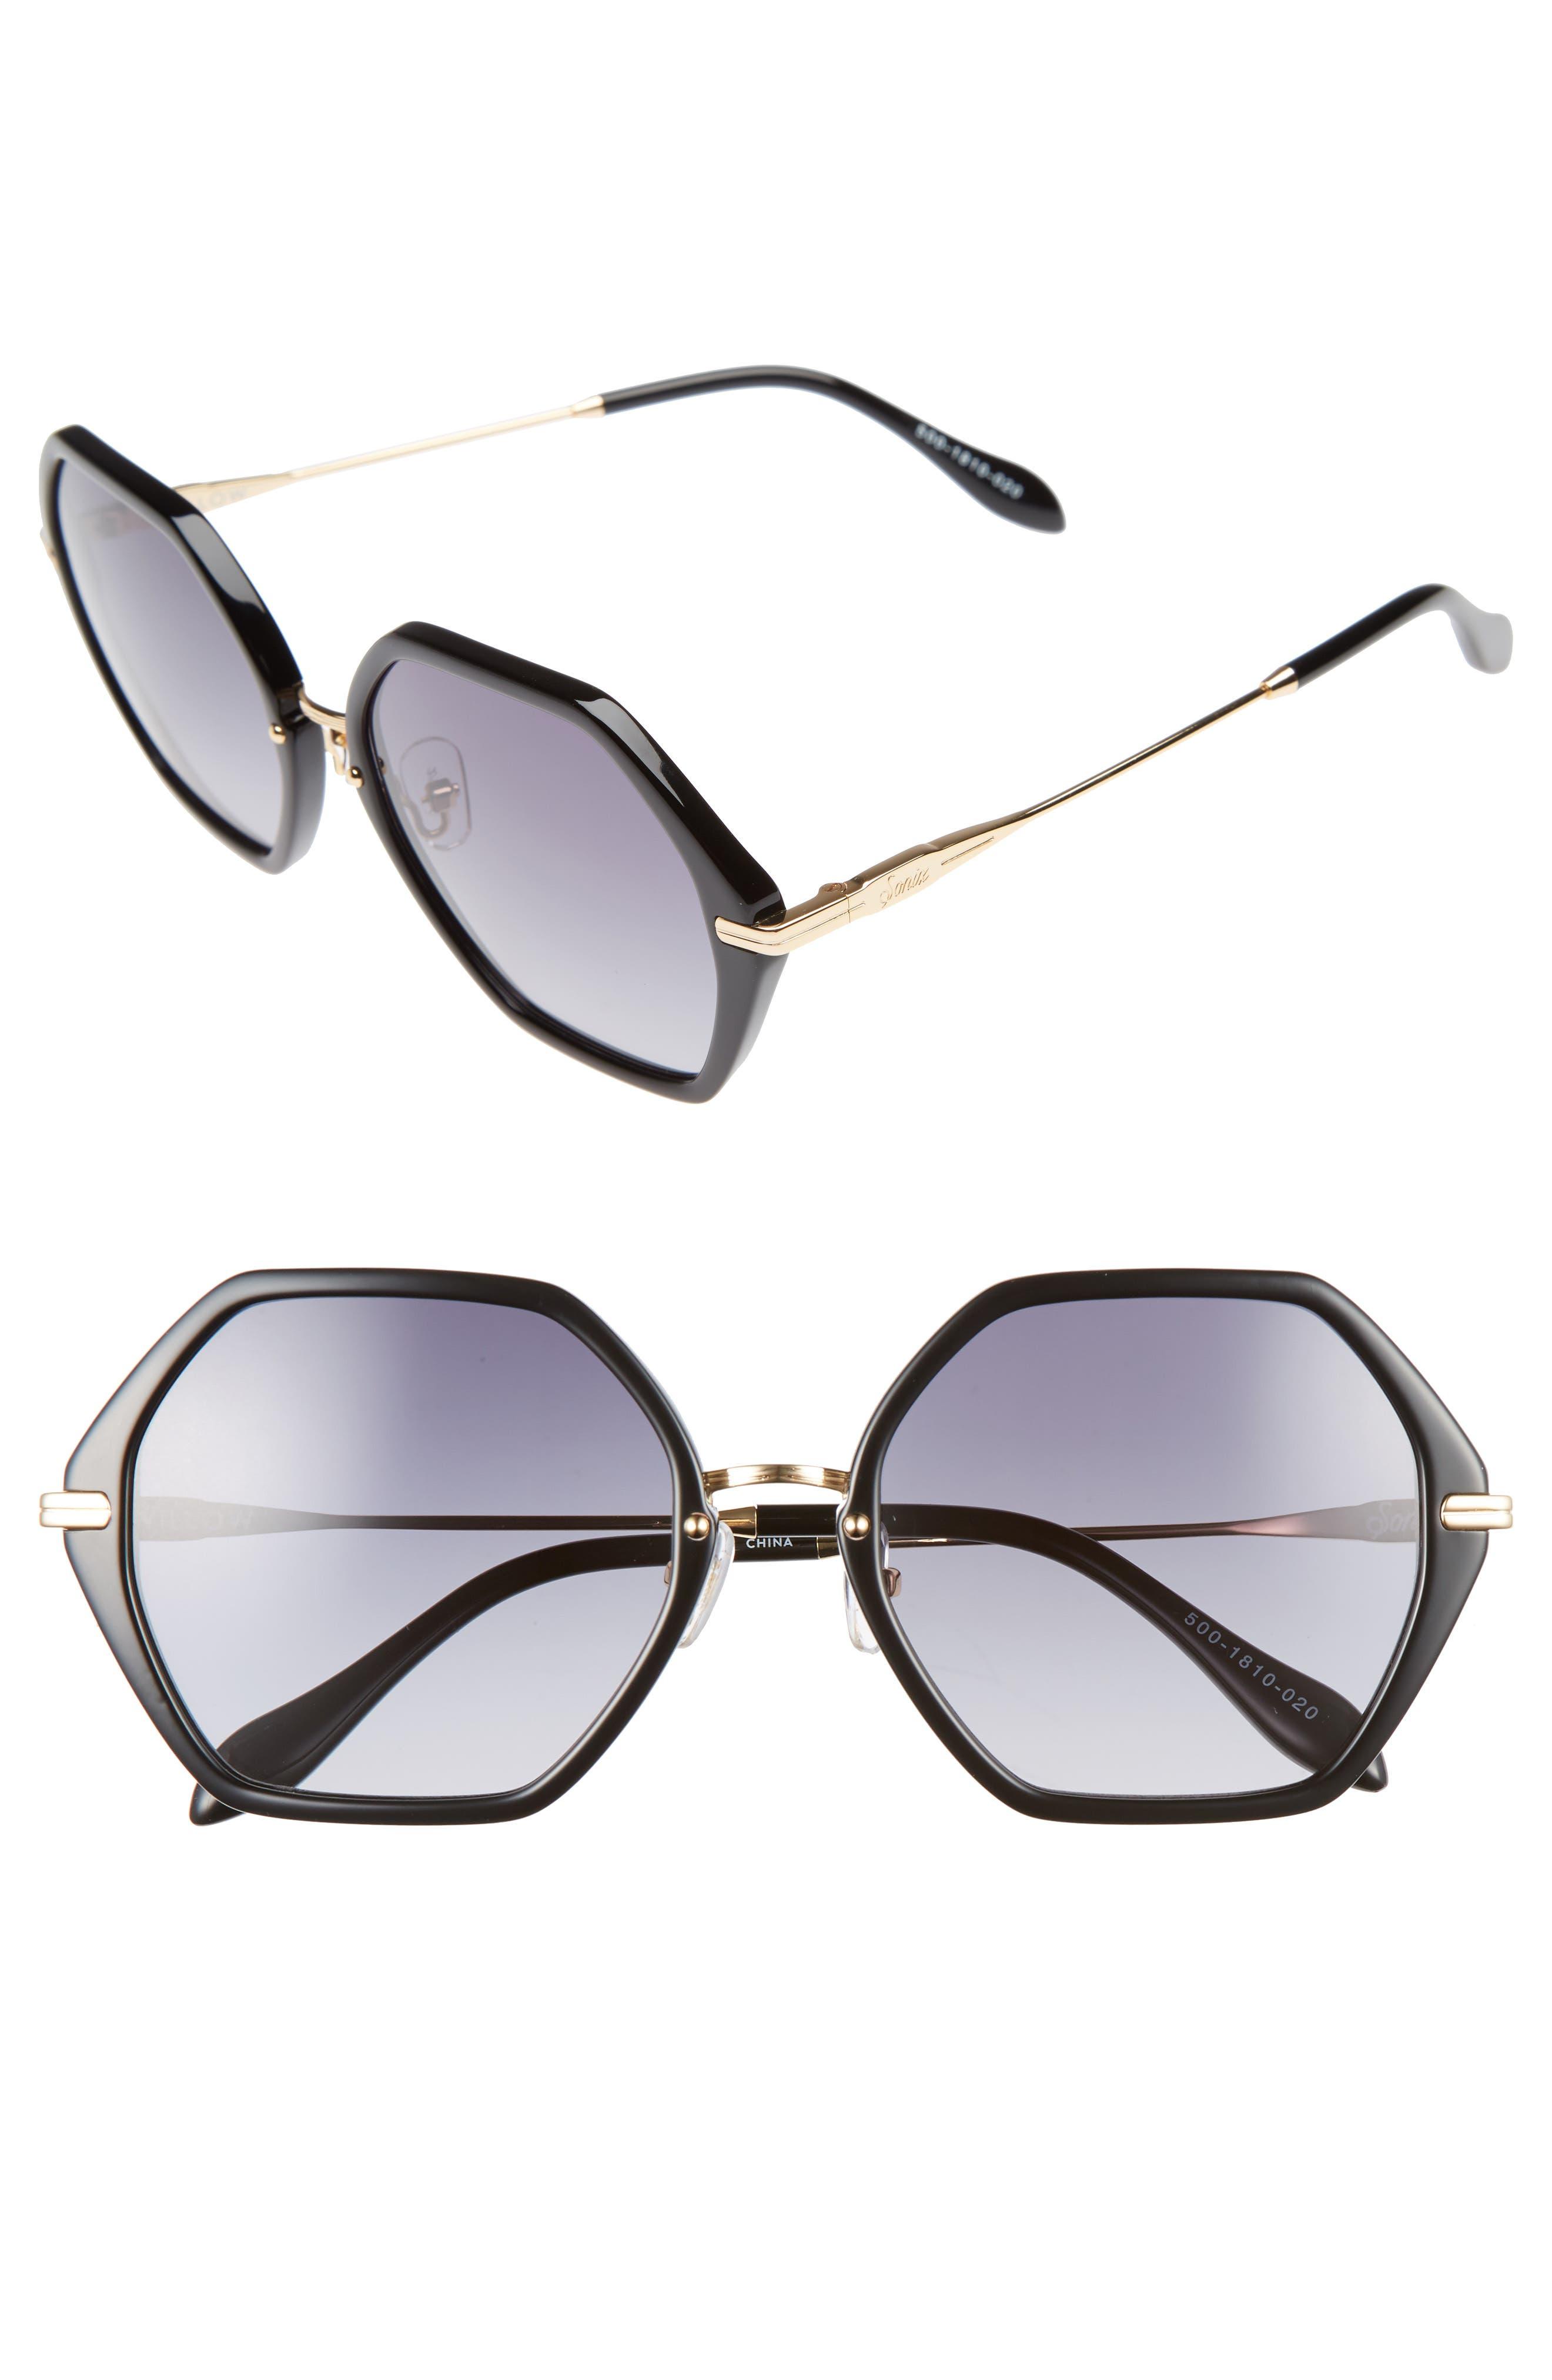 Sonix Willow 55mm Octagon Sunglasses